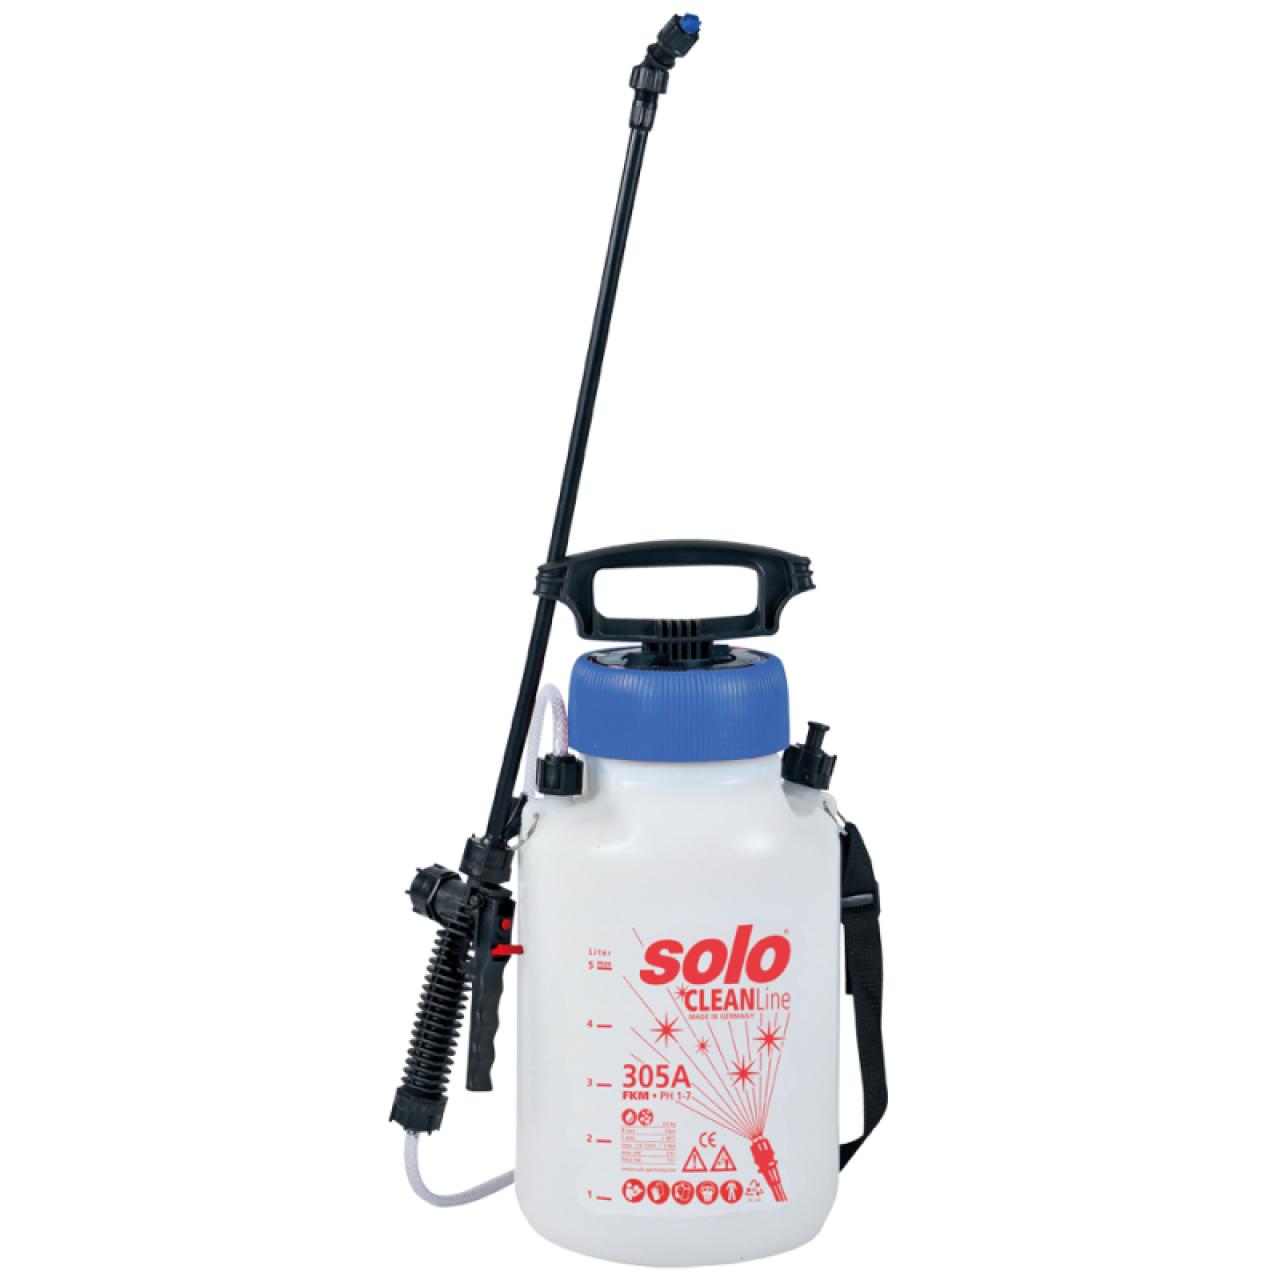 Druckspritze 305 A Cleaner, 5,0 L Füllmenge